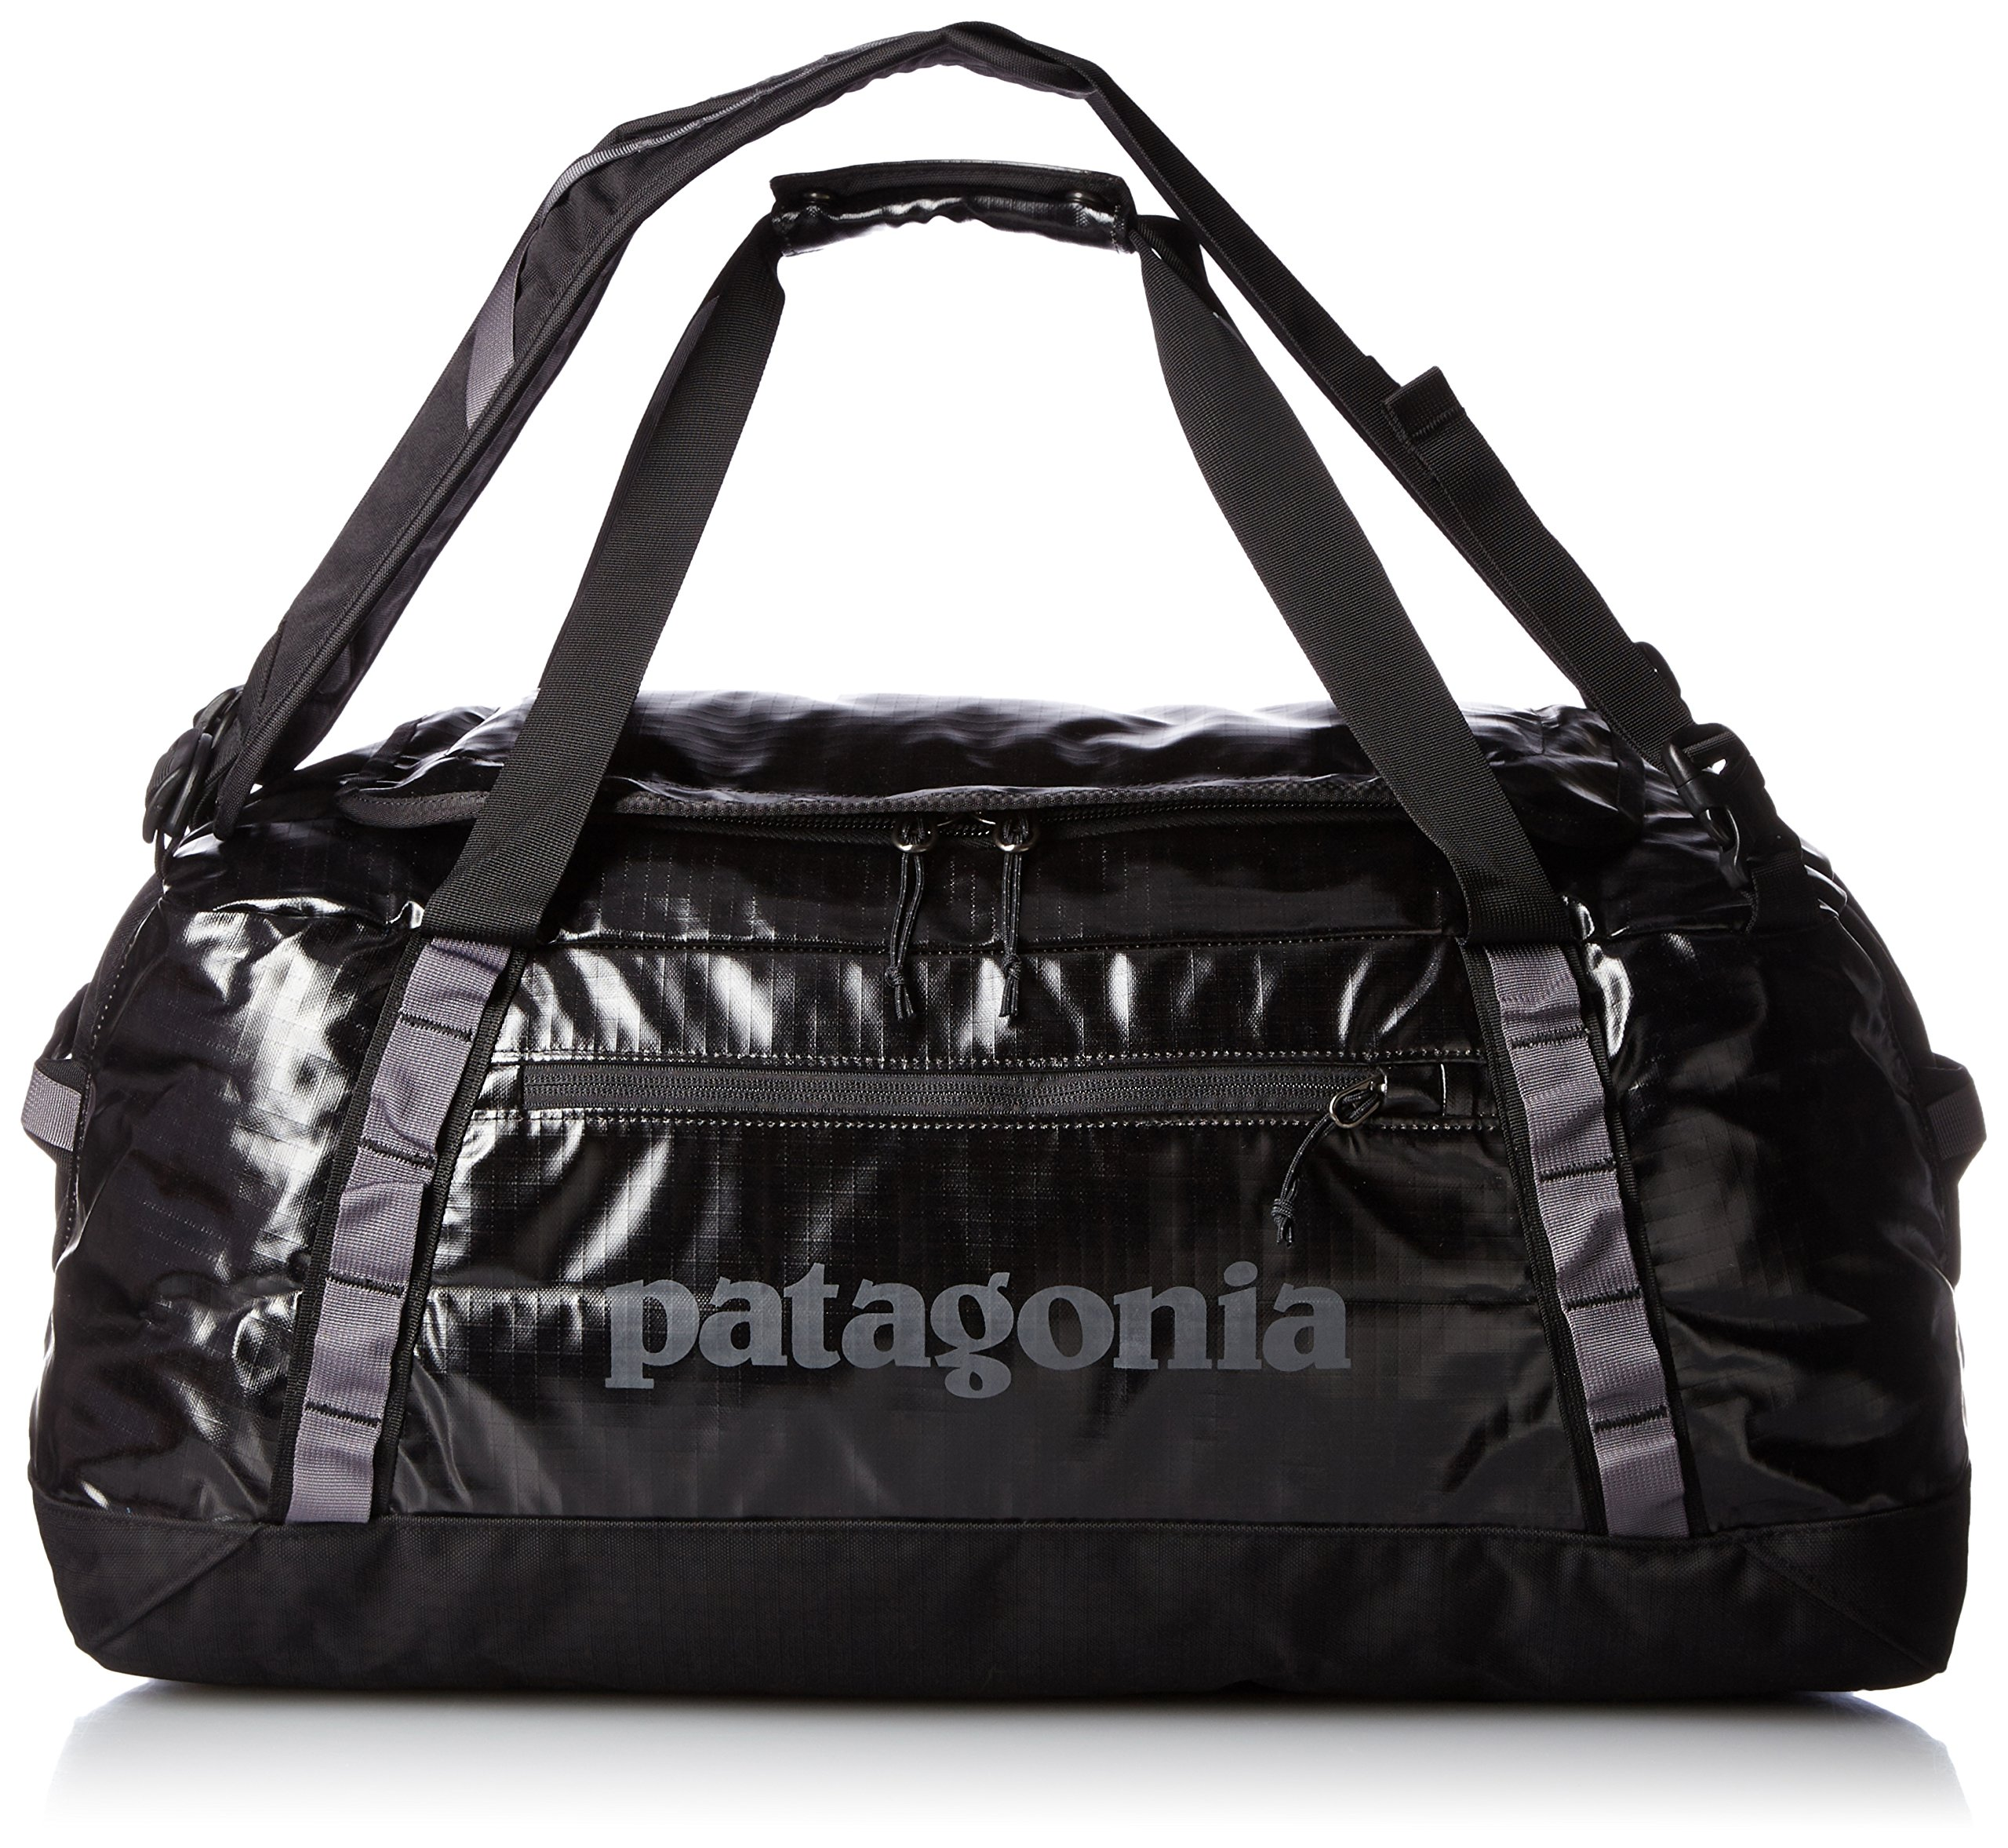 Patagonia Mens Bag One Size Blk